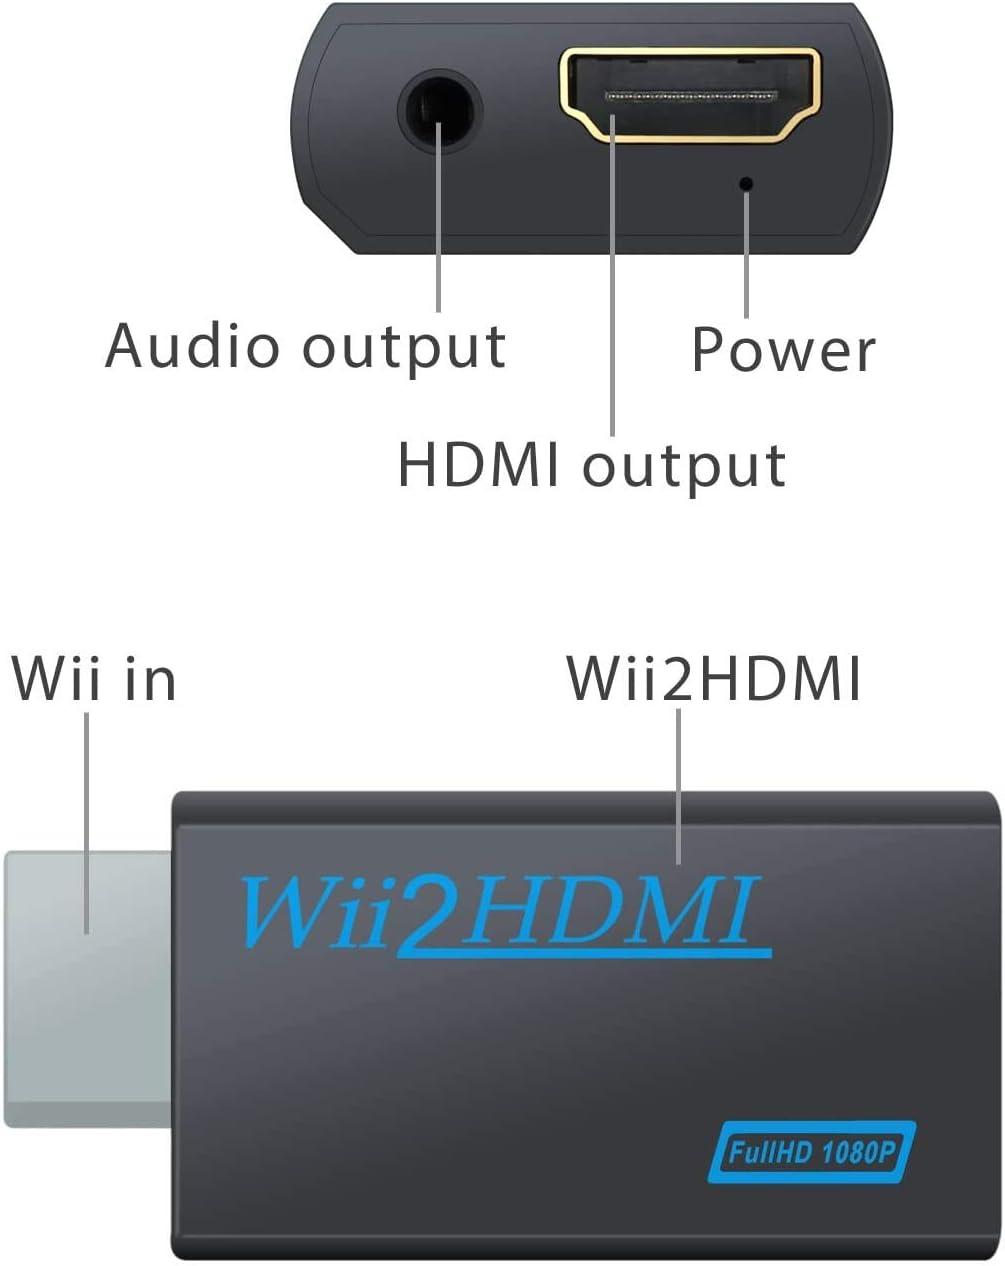 WesKimed Convertidor Wii a HDMI Adaptador Wii2HDMI Converter Wii to HDMI Conector con Salida de Video Full HD 1080p 720p y Audio de 3.5mm para Wii U Wii Smart HDTV Monitor Proyector